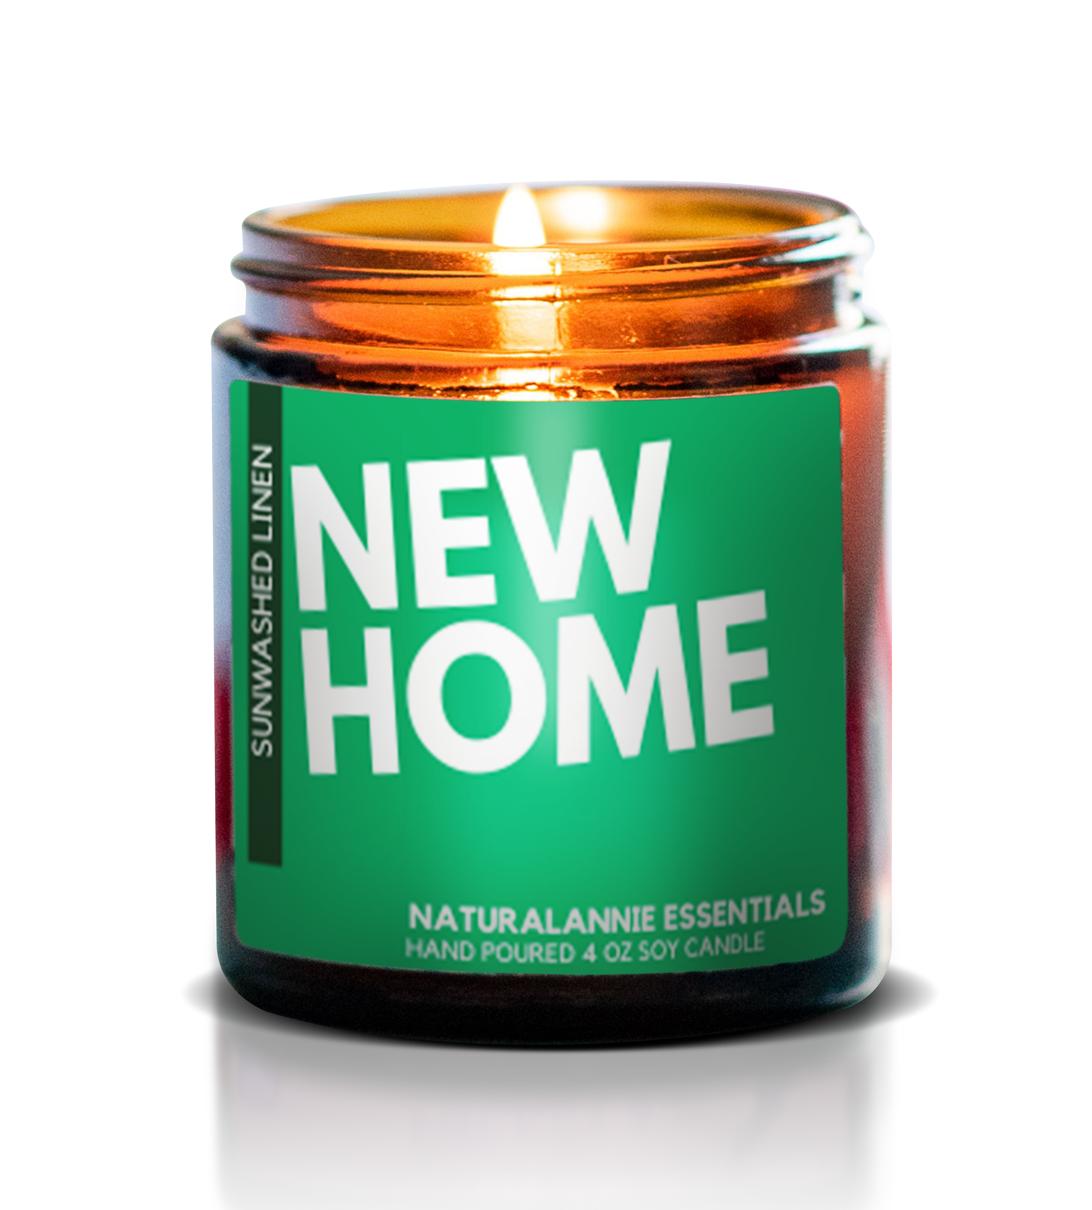 NaturalAnnie Essentials New Home - 4oz - Sunwashed Linen